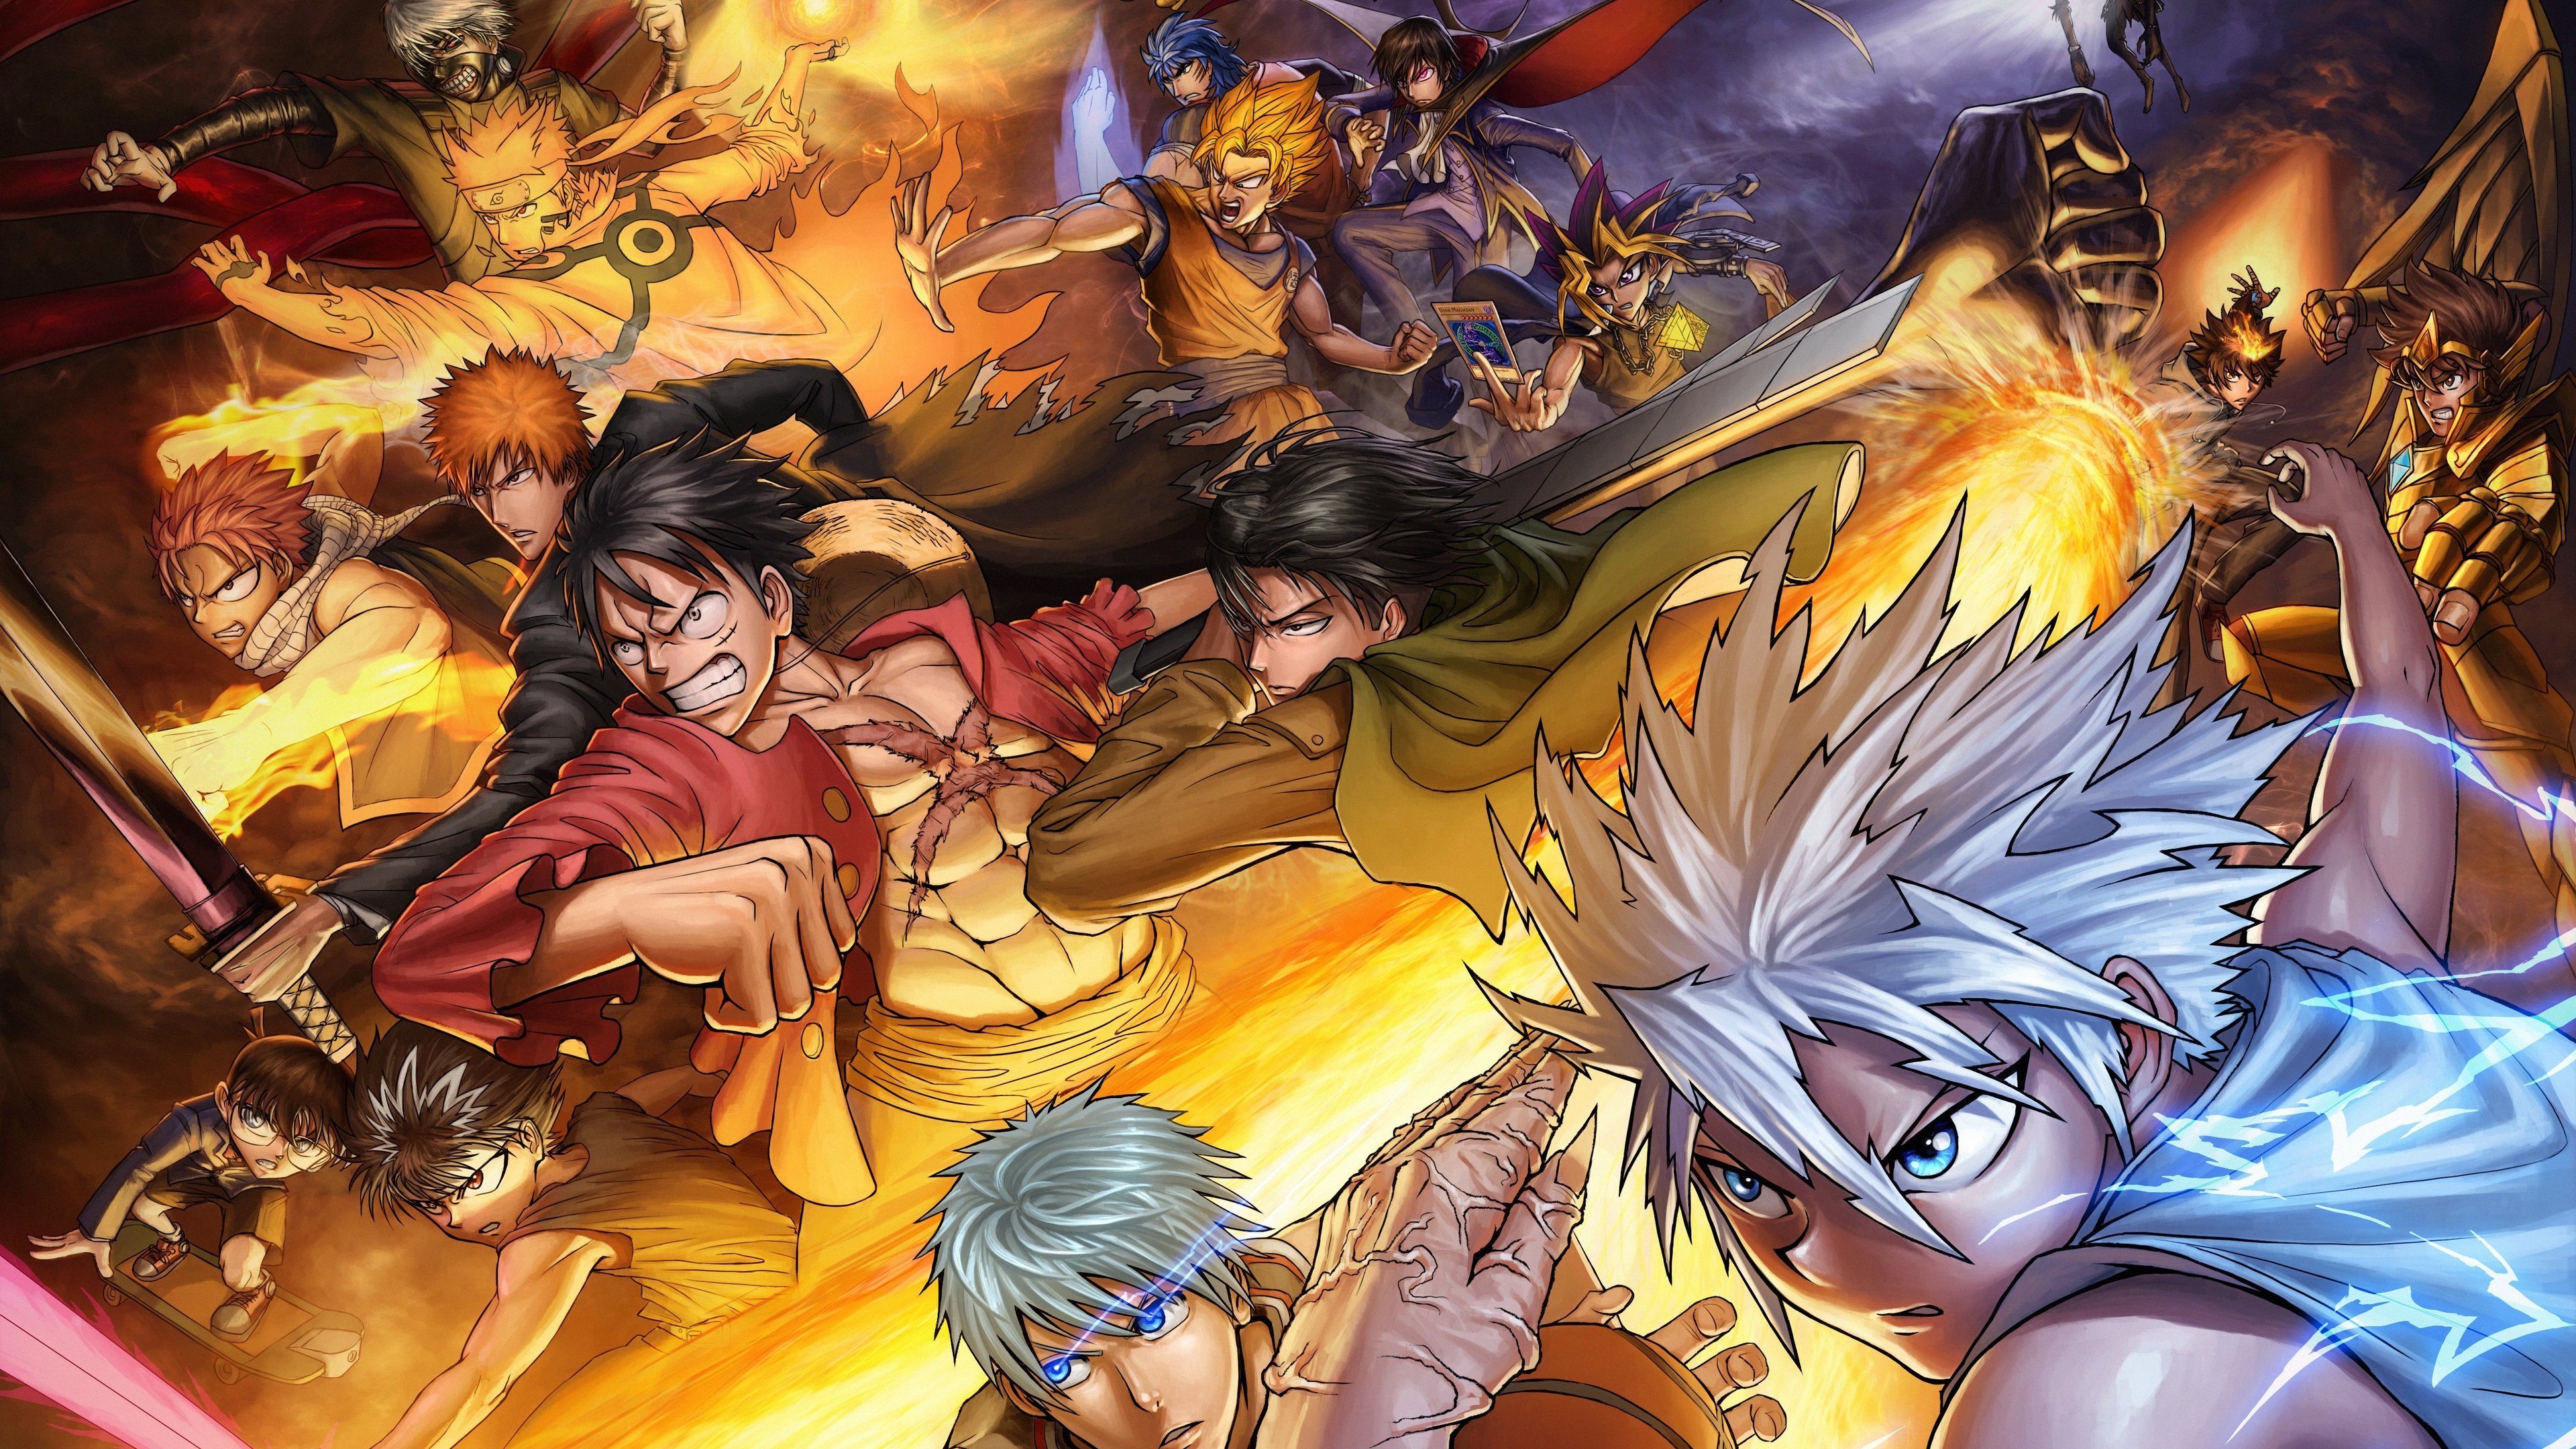 40 Animes Crossover 4k Wallpapers On Wallpapersafari